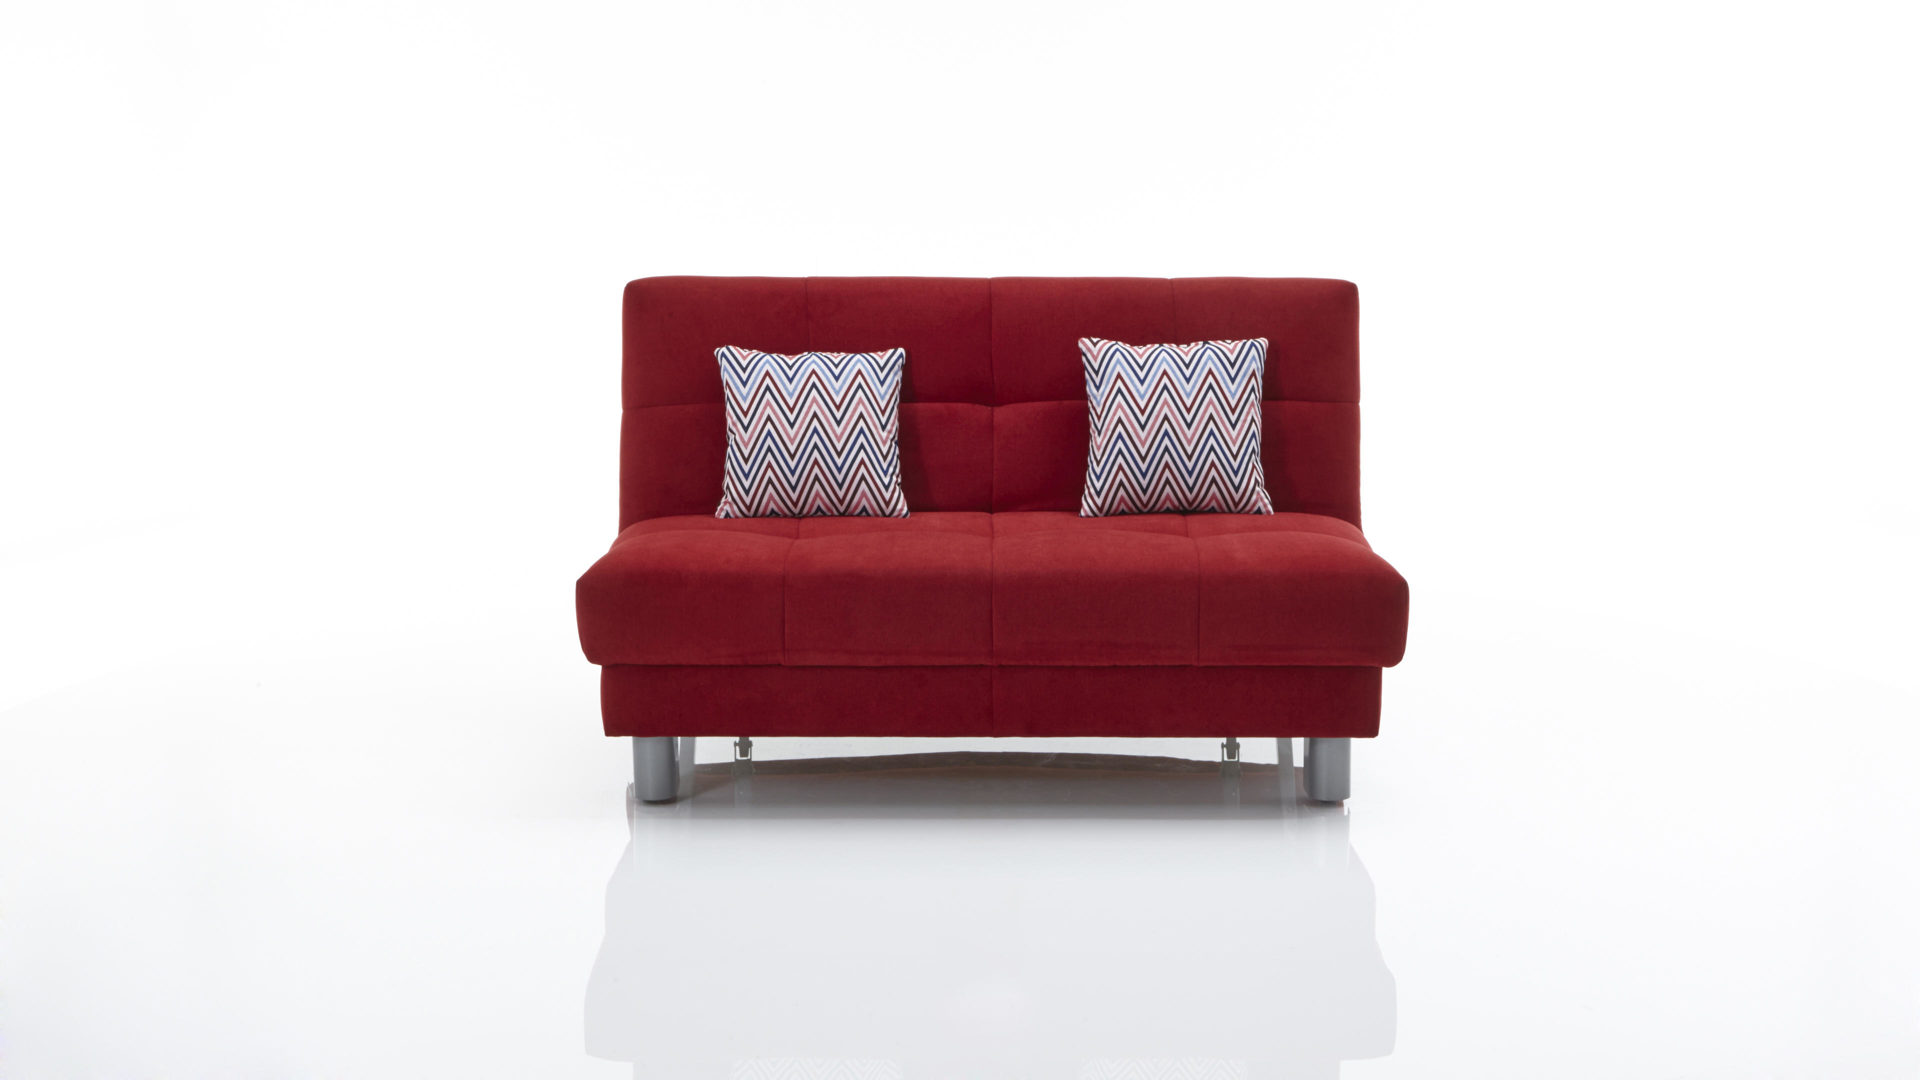 Sofa 140 Cm Breit einrichtungspartnerring markenshops alle kategorien partnerring